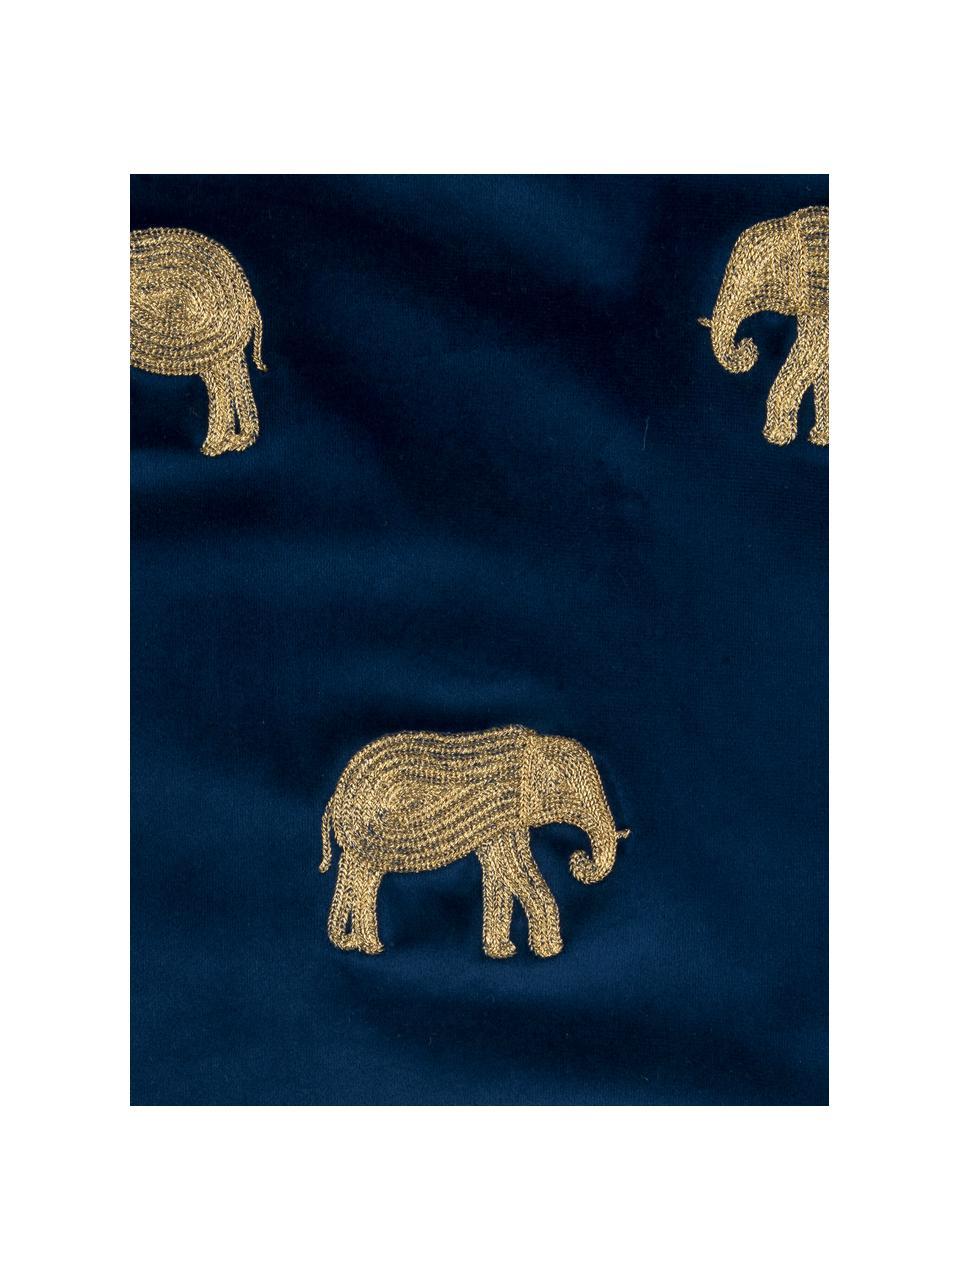 Bestickte Samt-Kissenhülle Elefco in Blau/Gold, 100% Polyestersamt, Dunkelblau, Goldfarben, 40 x 40 cm